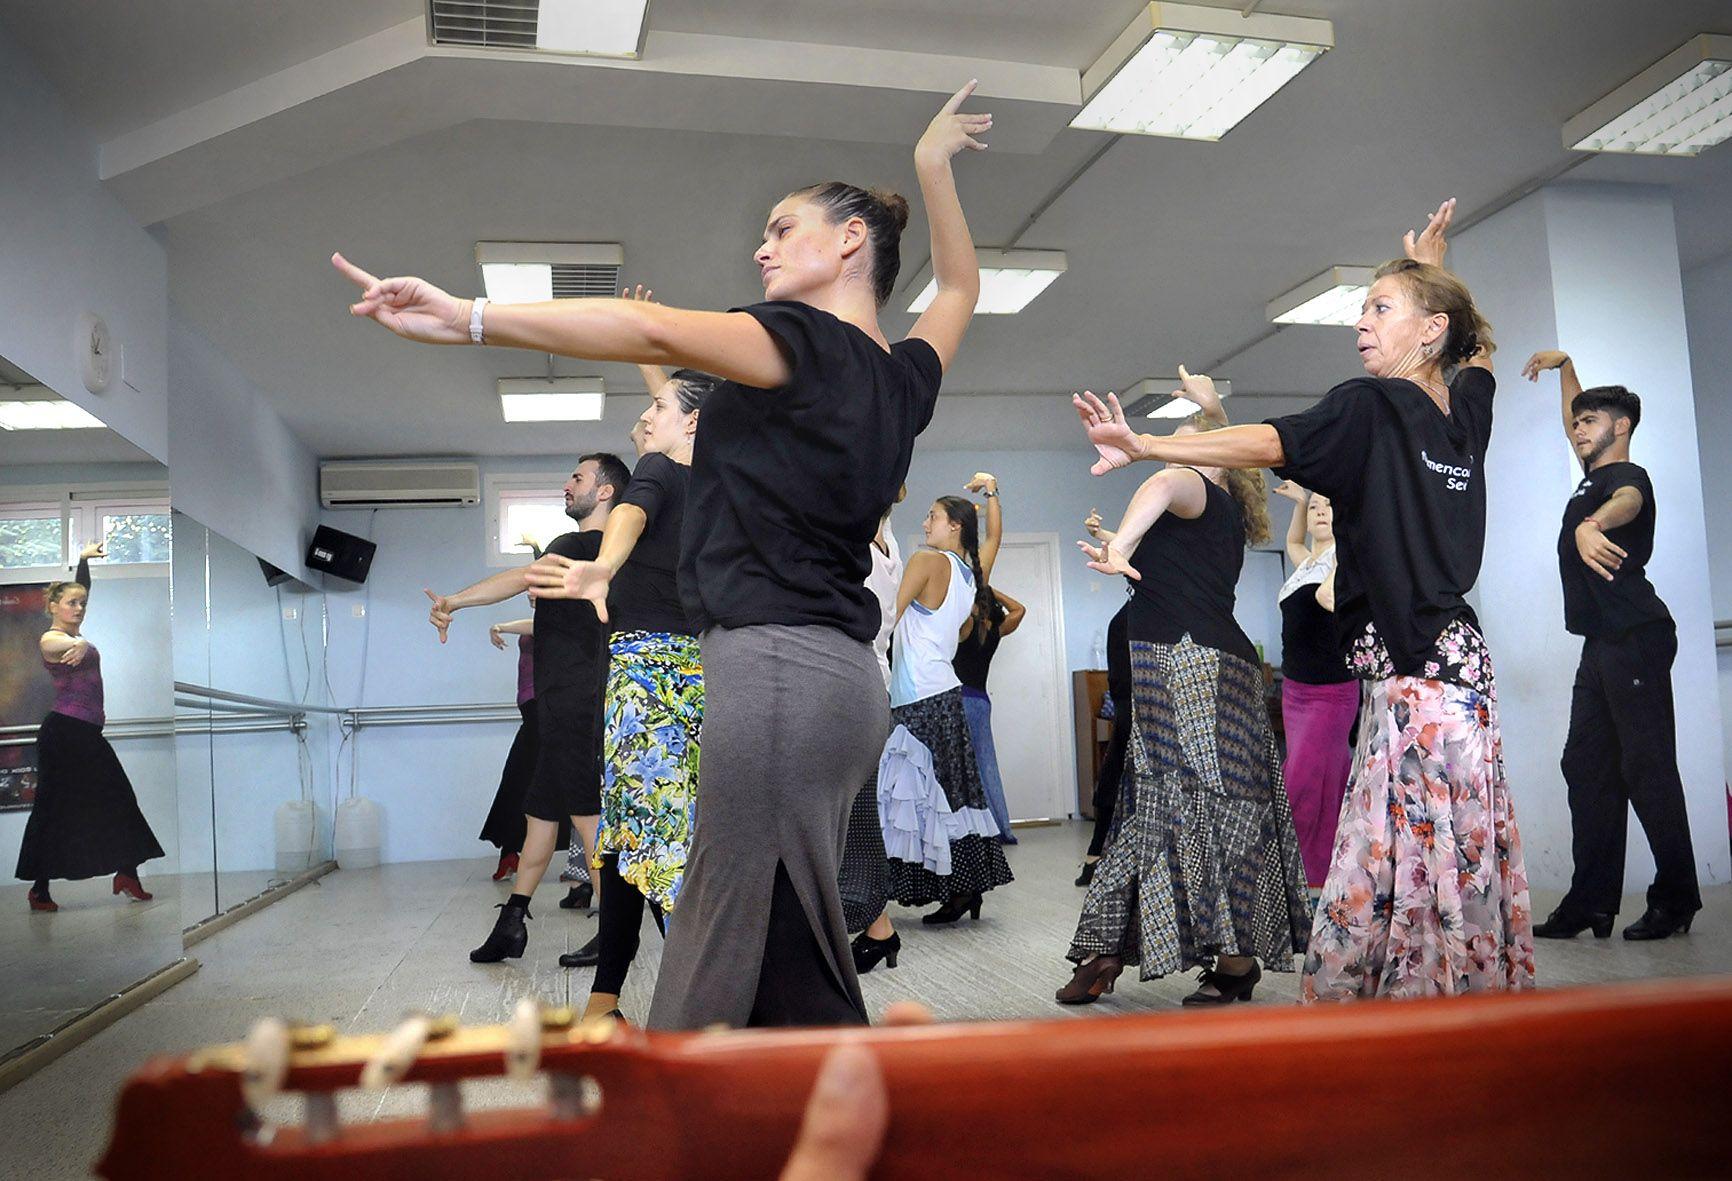 Cursos_de__verano___Escuela_de_Baile_Jerez__01